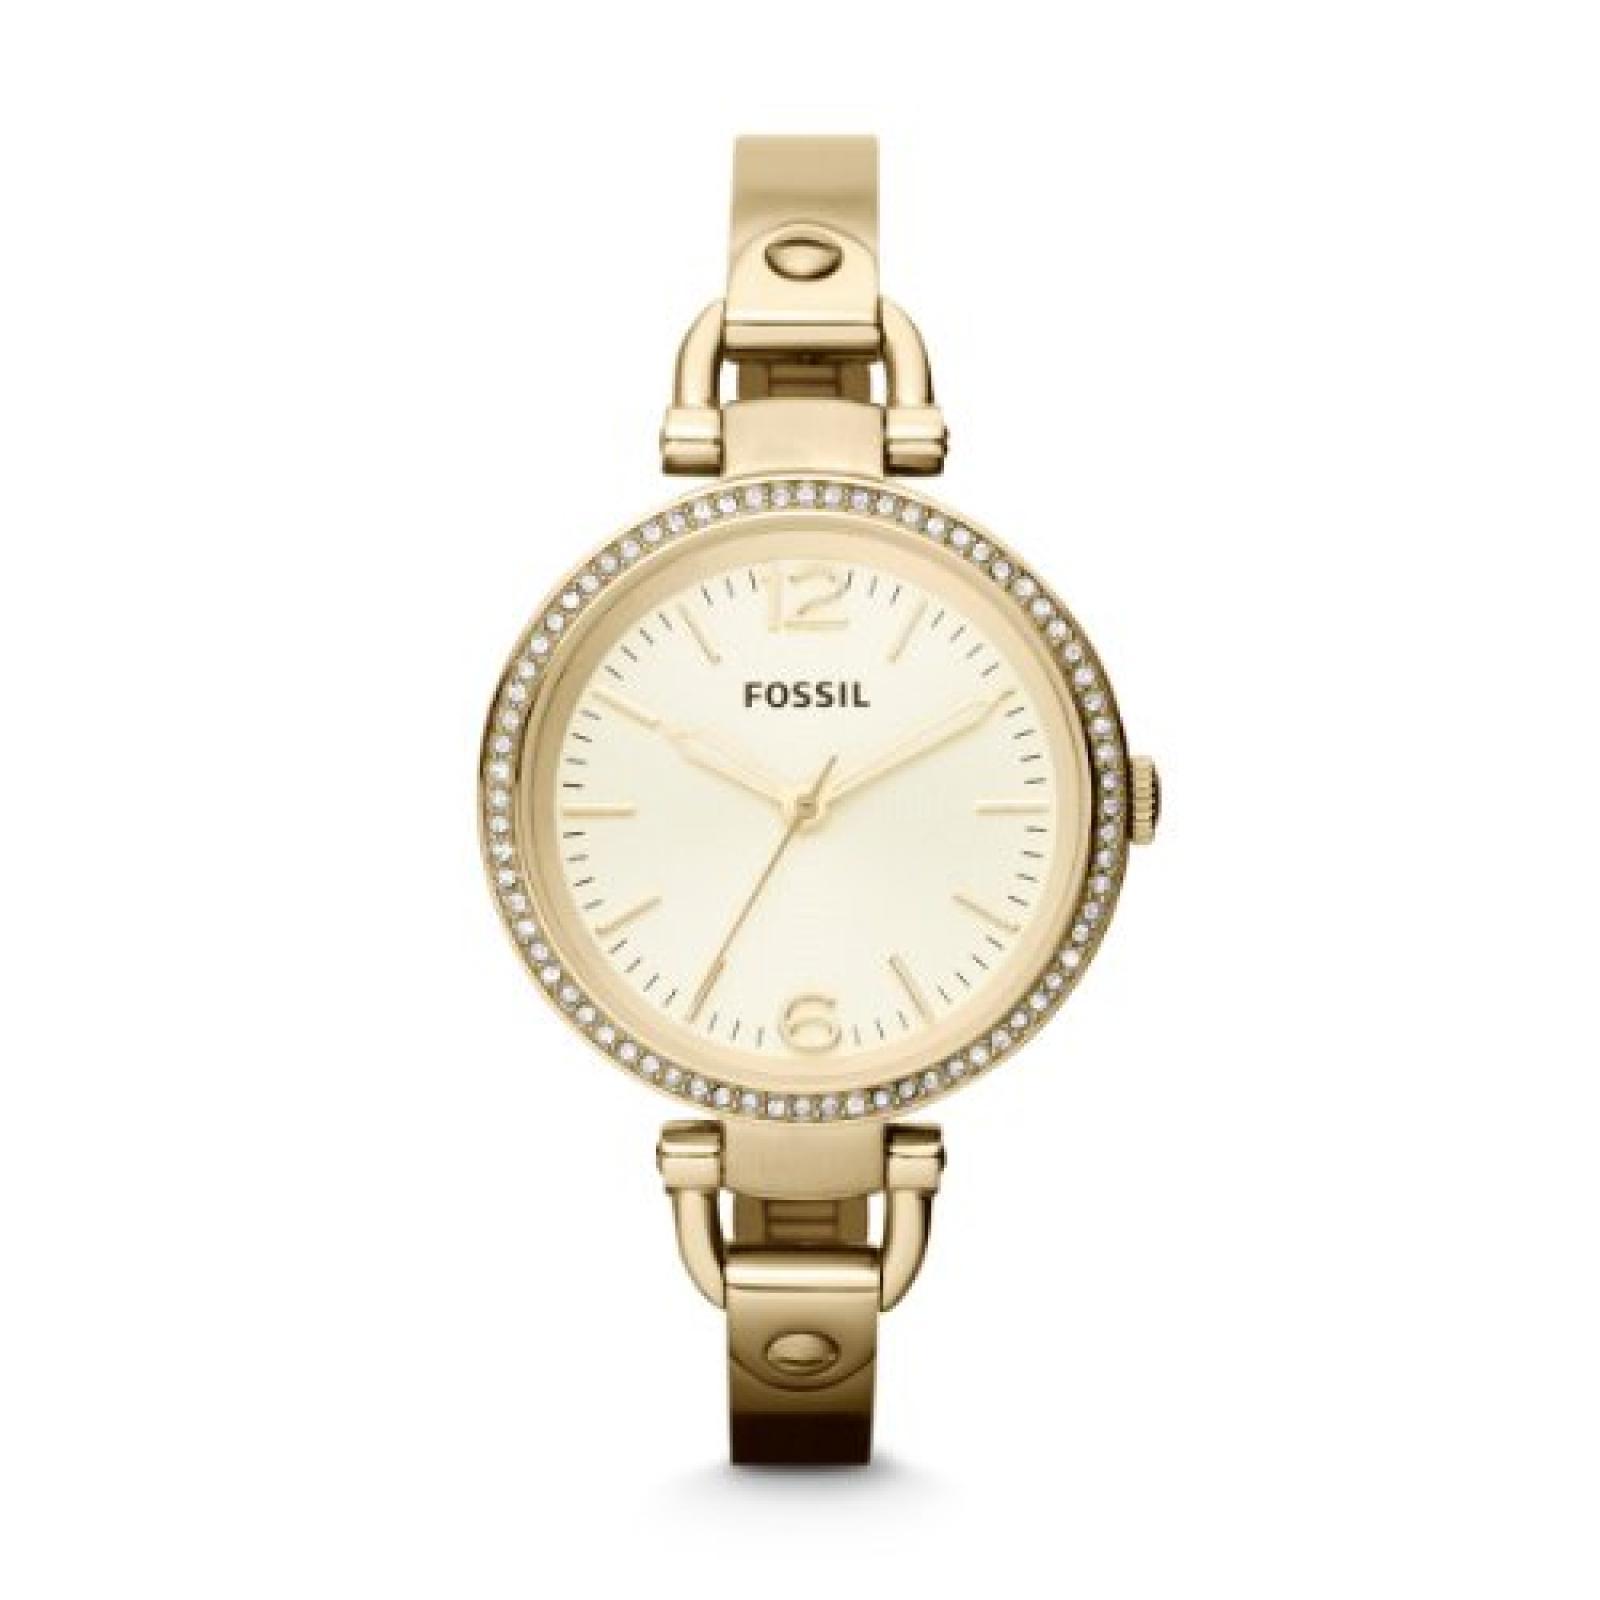 Fossil Damen-Armbanduhr XS Analog Quarz Edelstahl ES3227